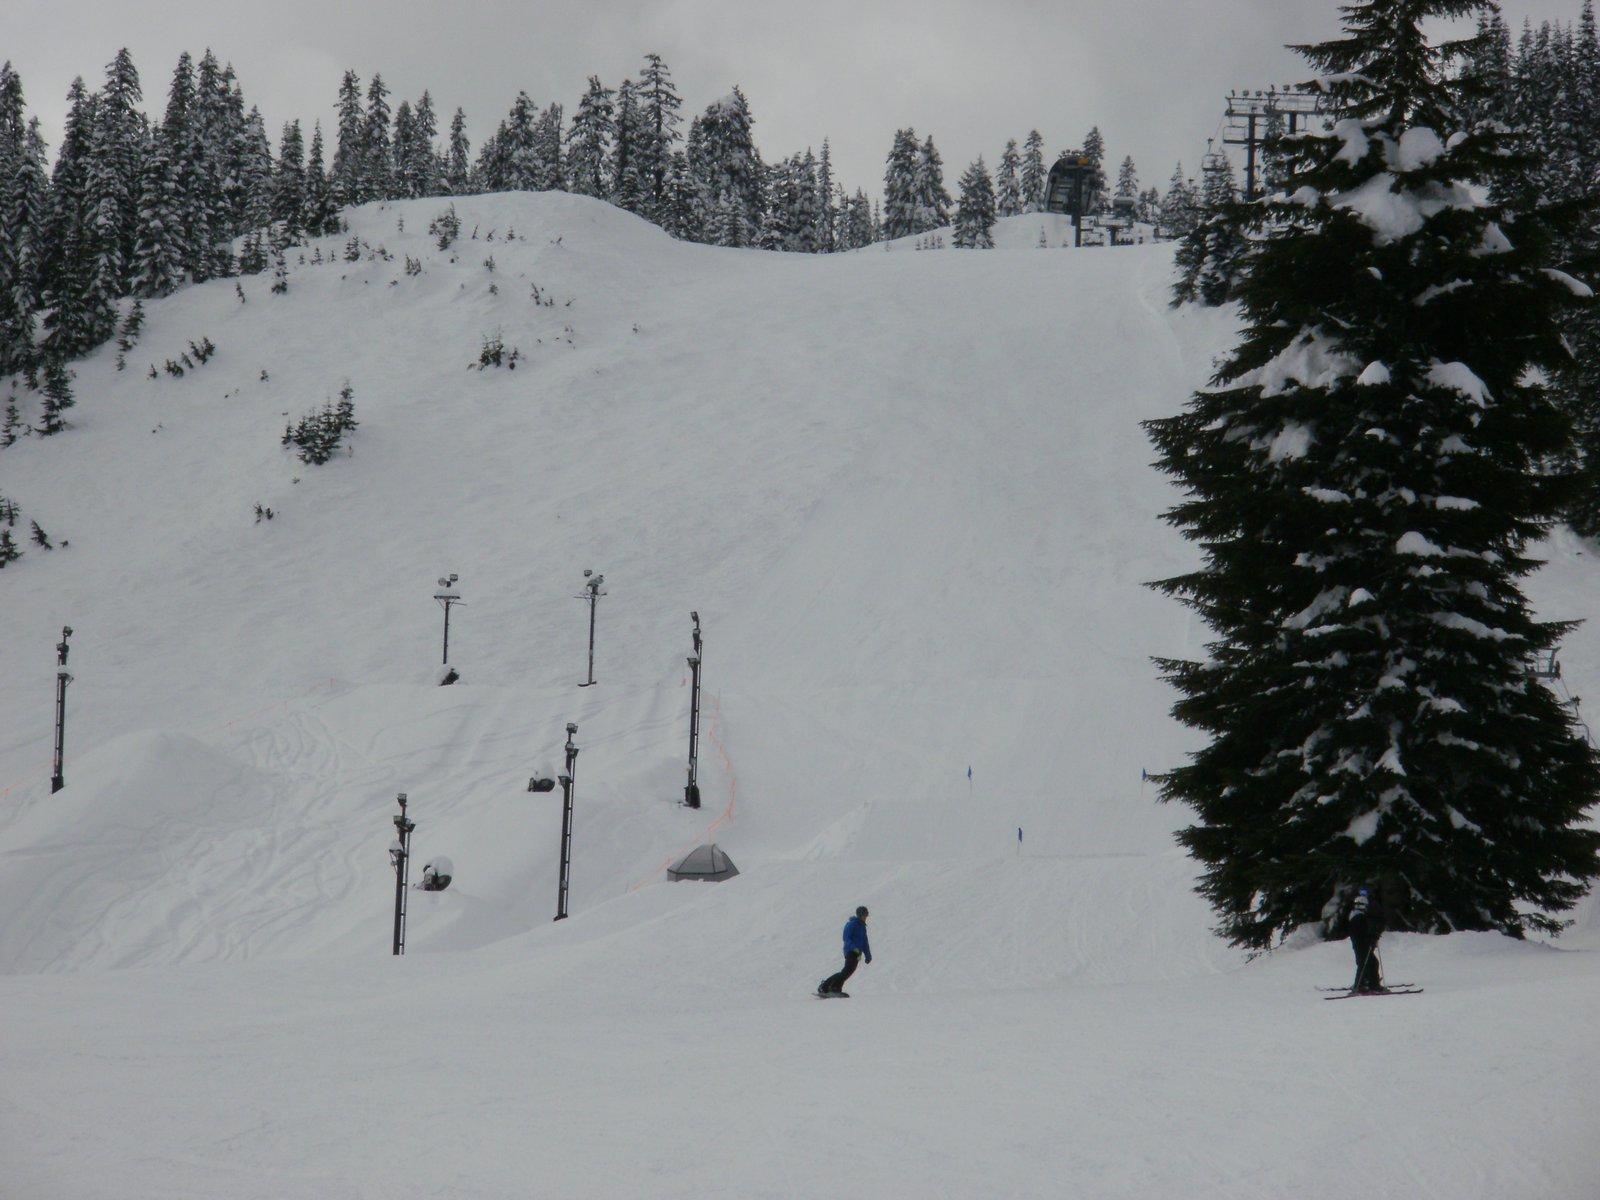 The summit half pipe